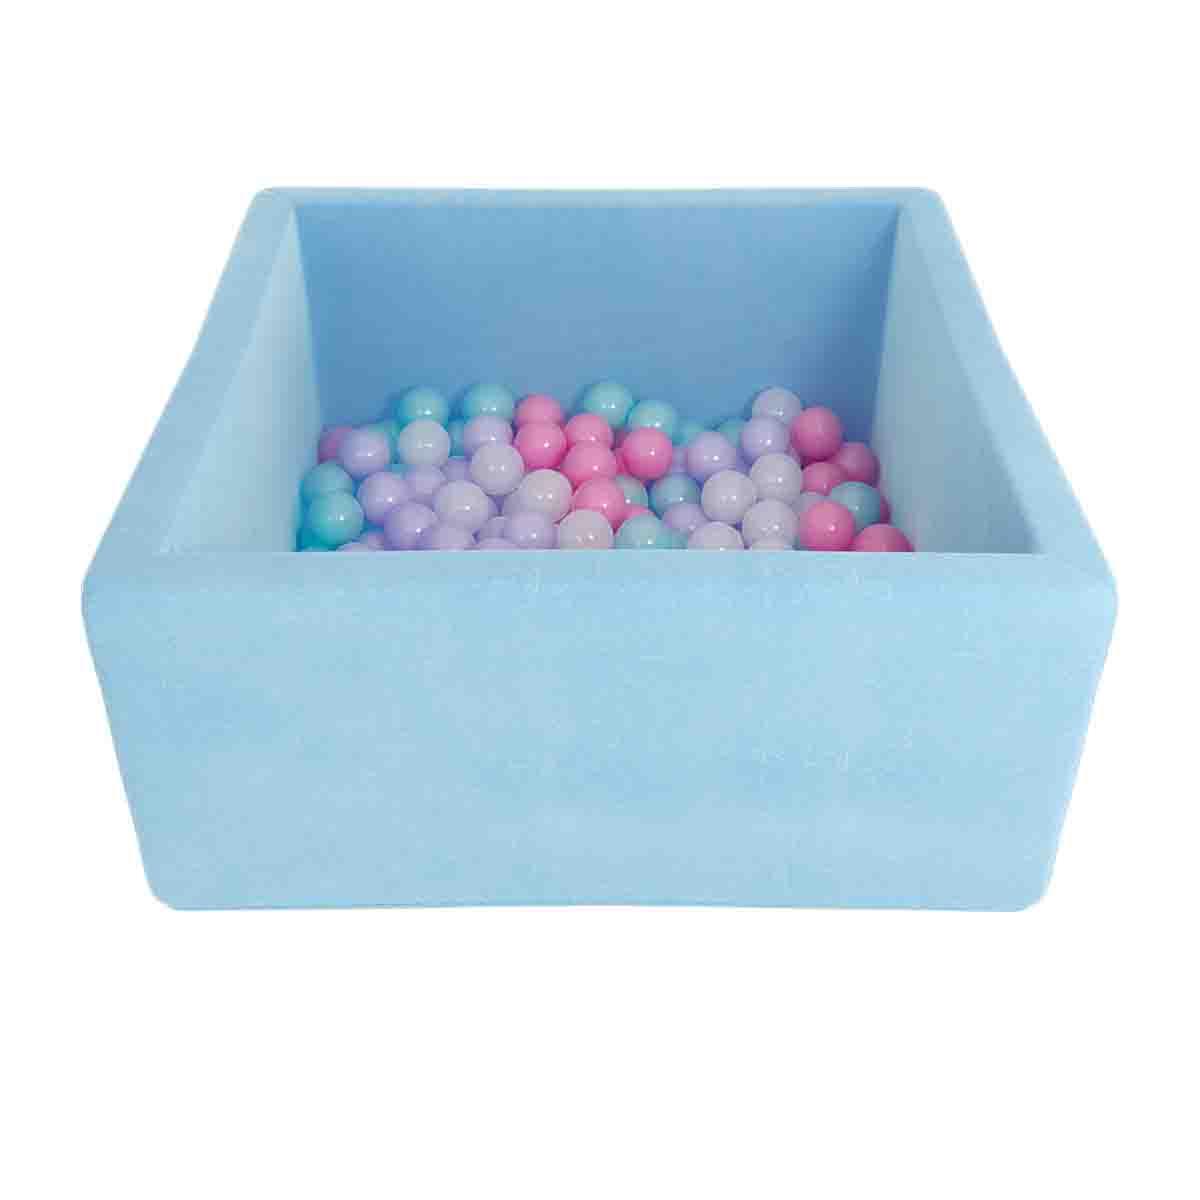 Купить Детский сухой бассейн Romana Airpool Box, голубой + 100 шаров, Romana (Романа)